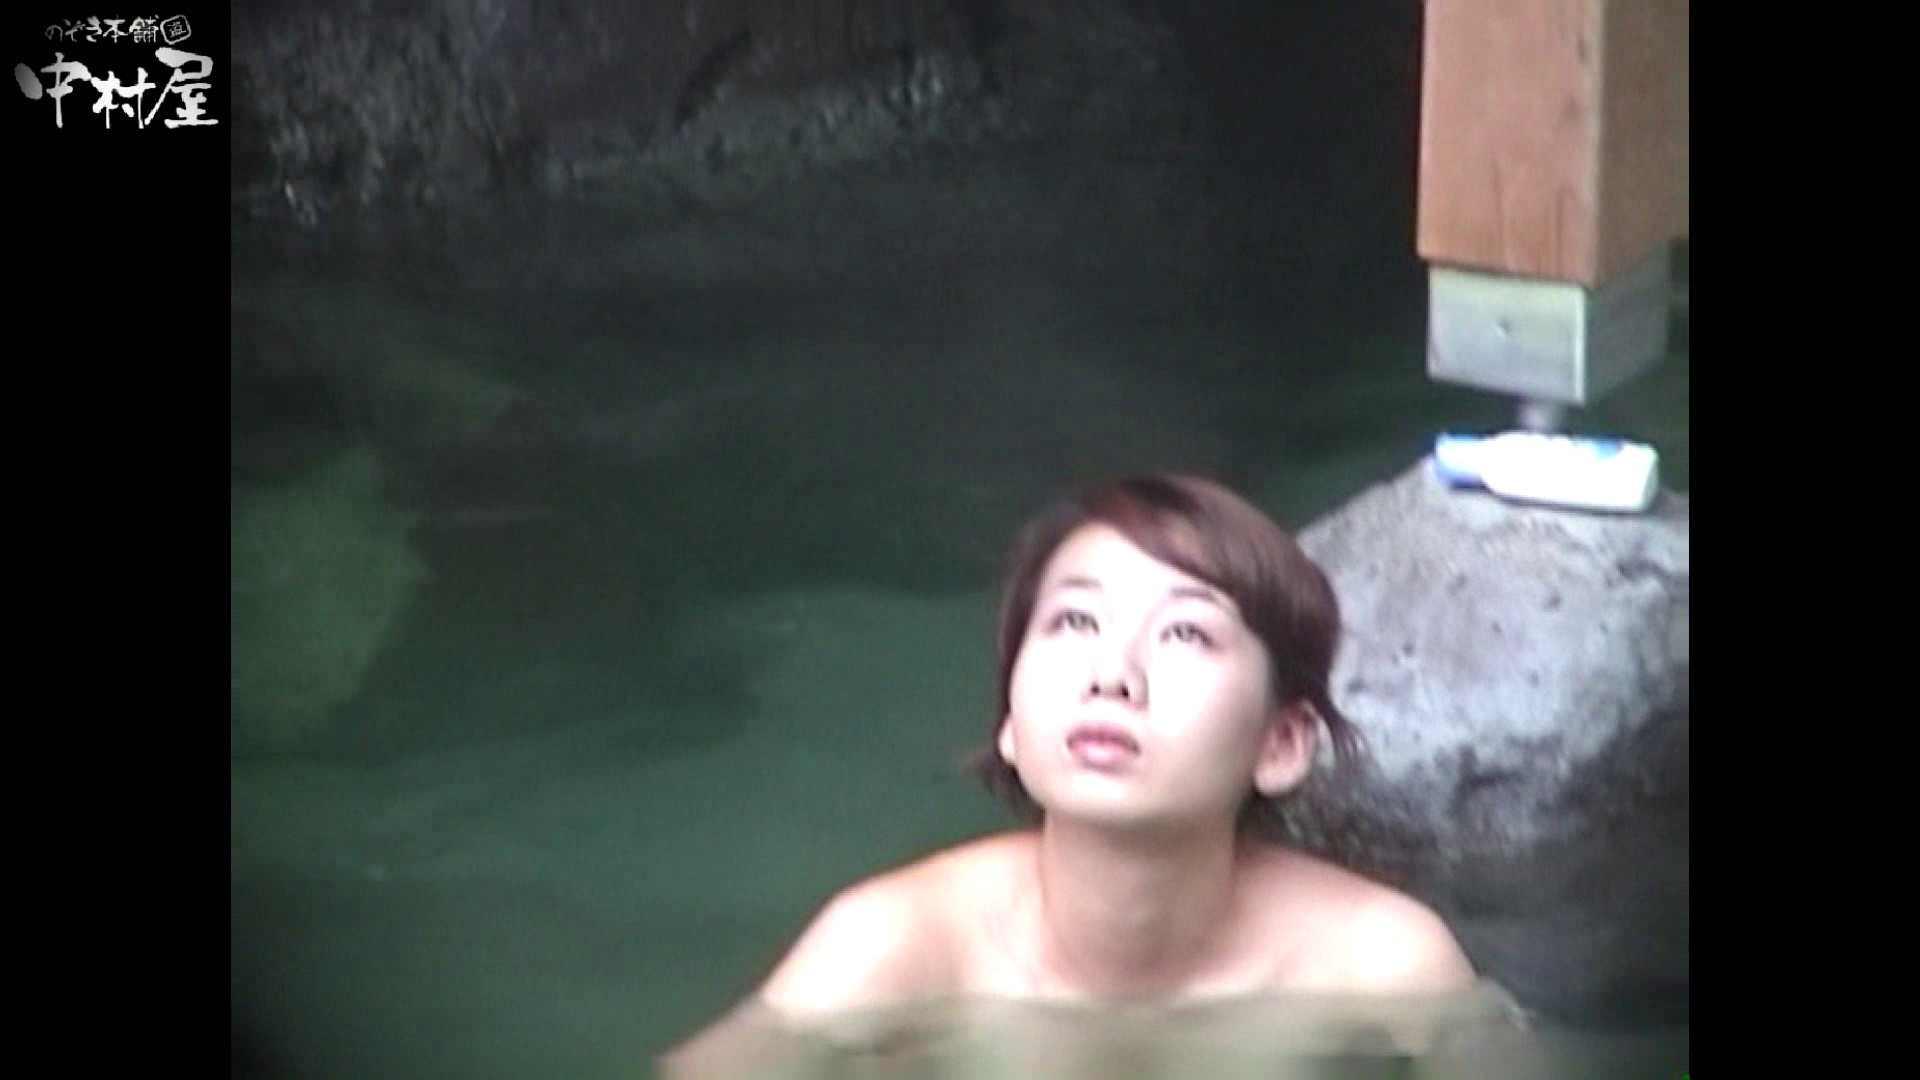 Aquaな露天風呂Vol.951 露天風呂編 | 盗撮シリーズ  108PIX 49